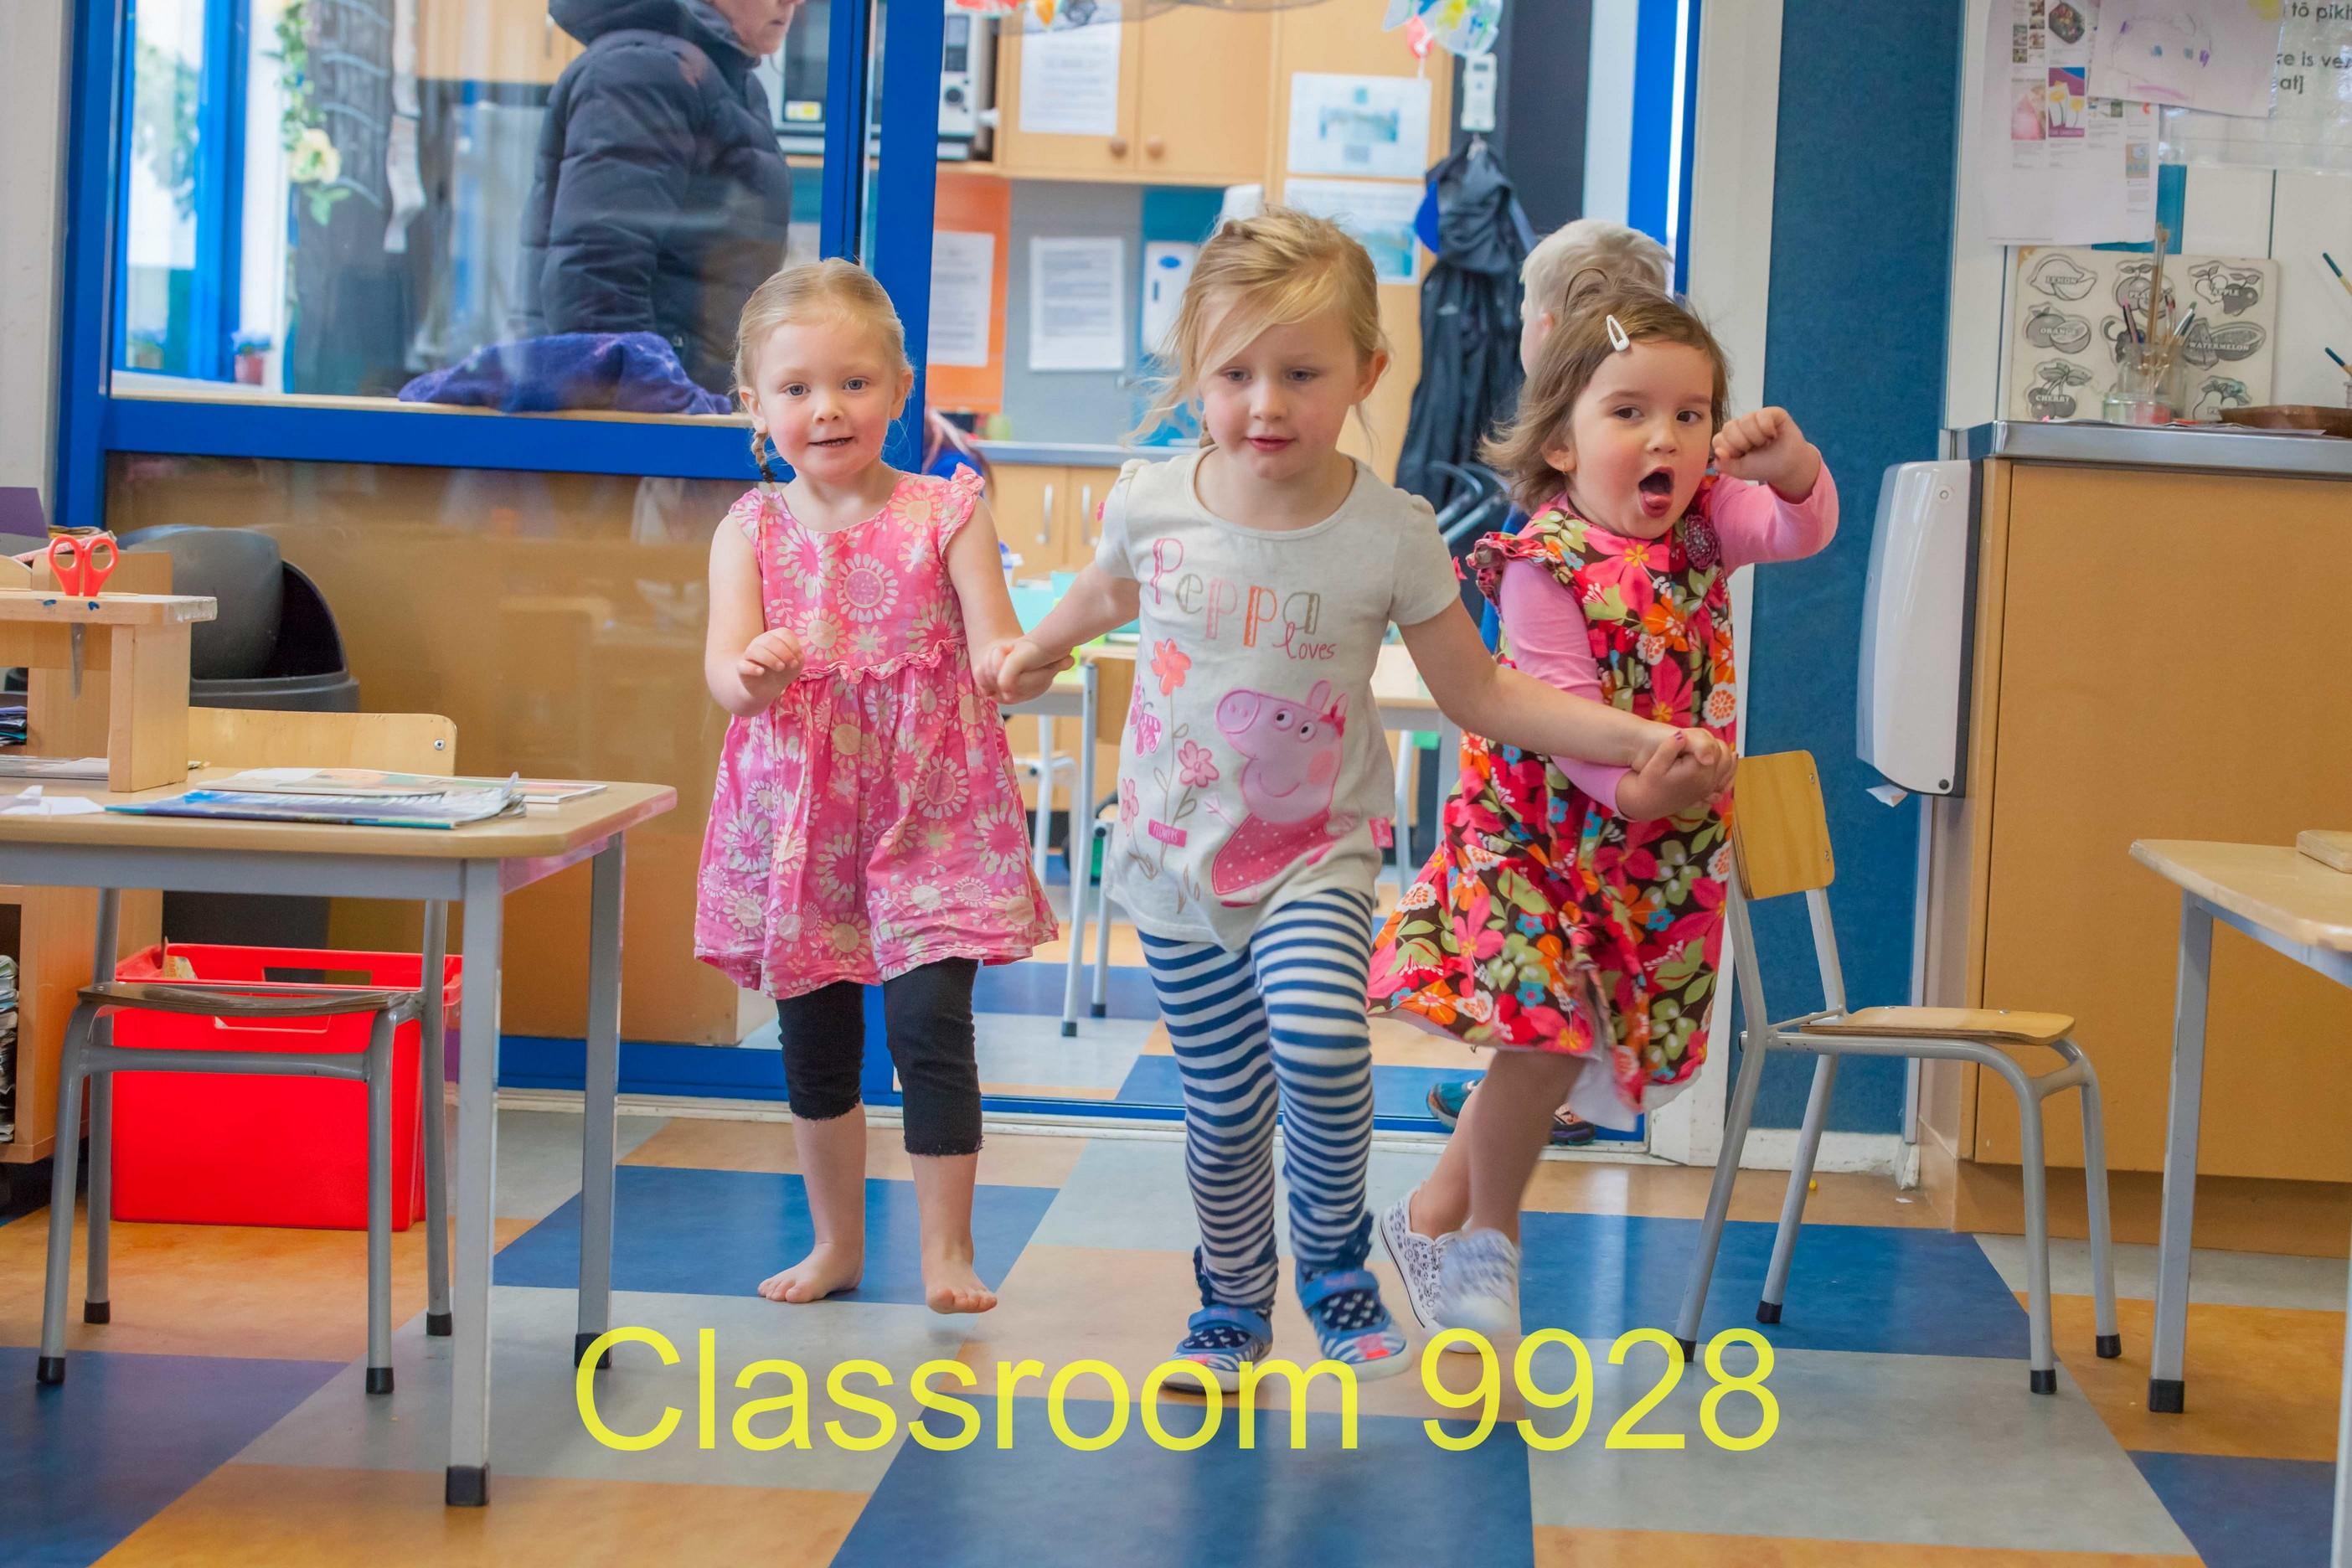 Classroom 9928